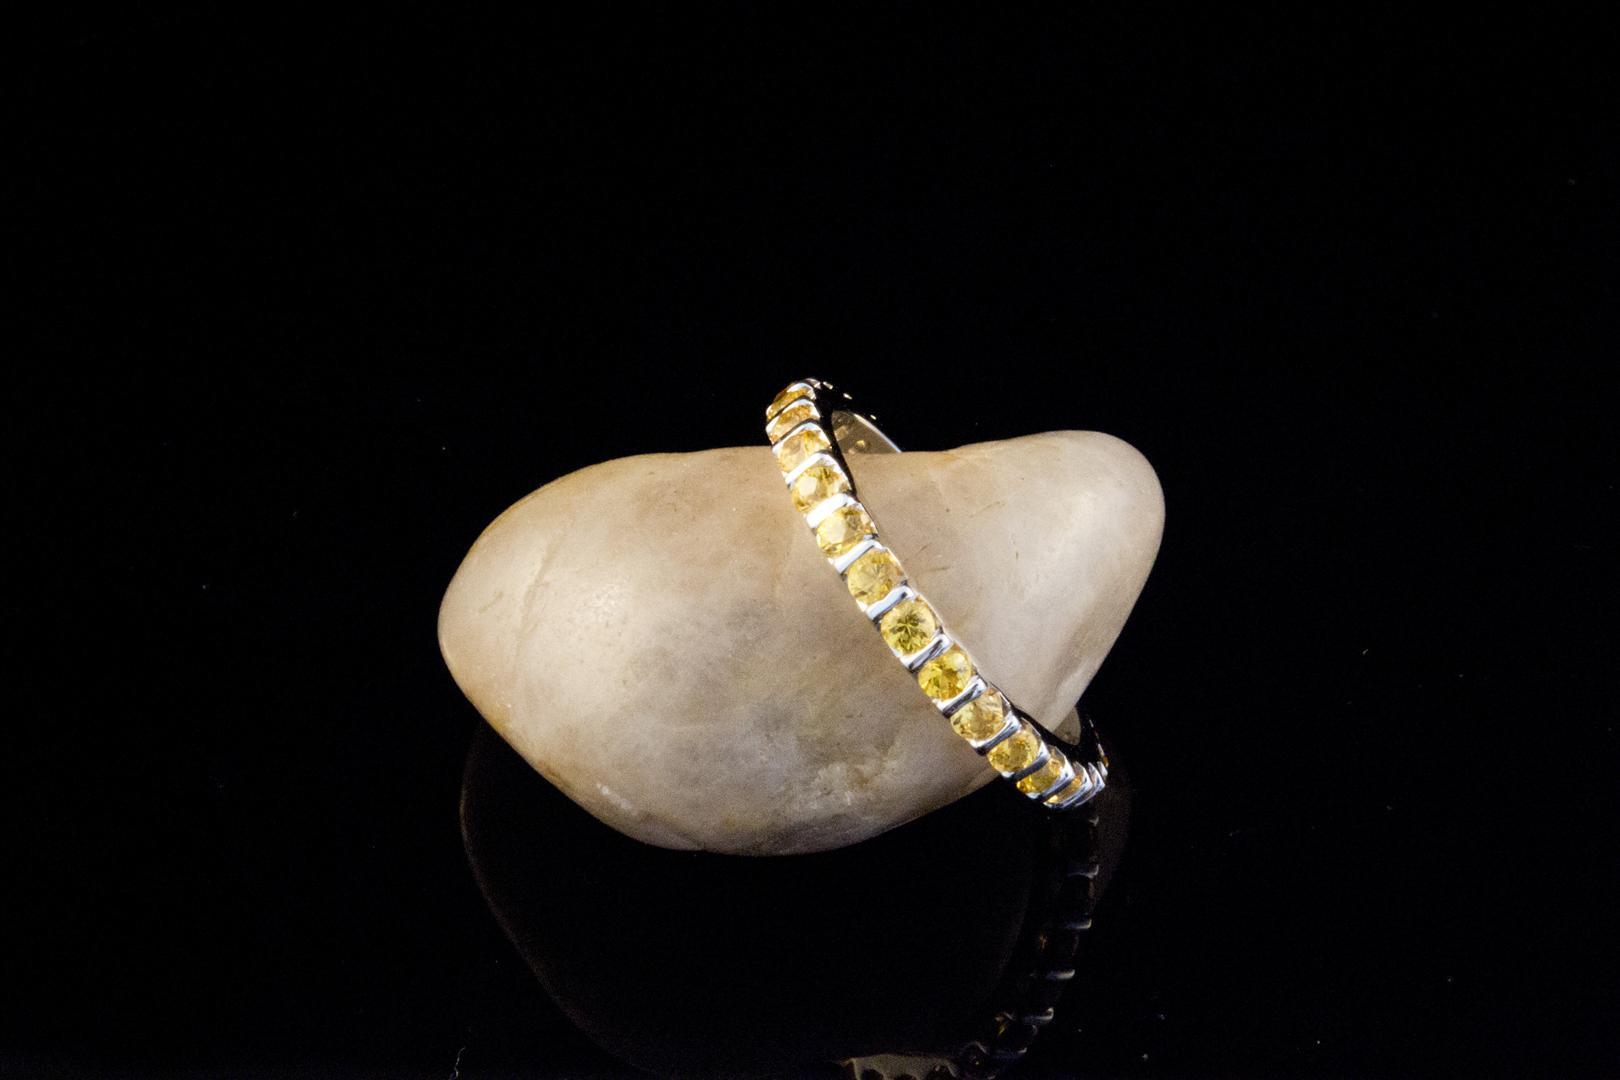 schmuckgebiet shop memoire ring 750 weissgold 18 karat gelbe saphire gold echten schmuck. Black Bedroom Furniture Sets. Home Design Ideas